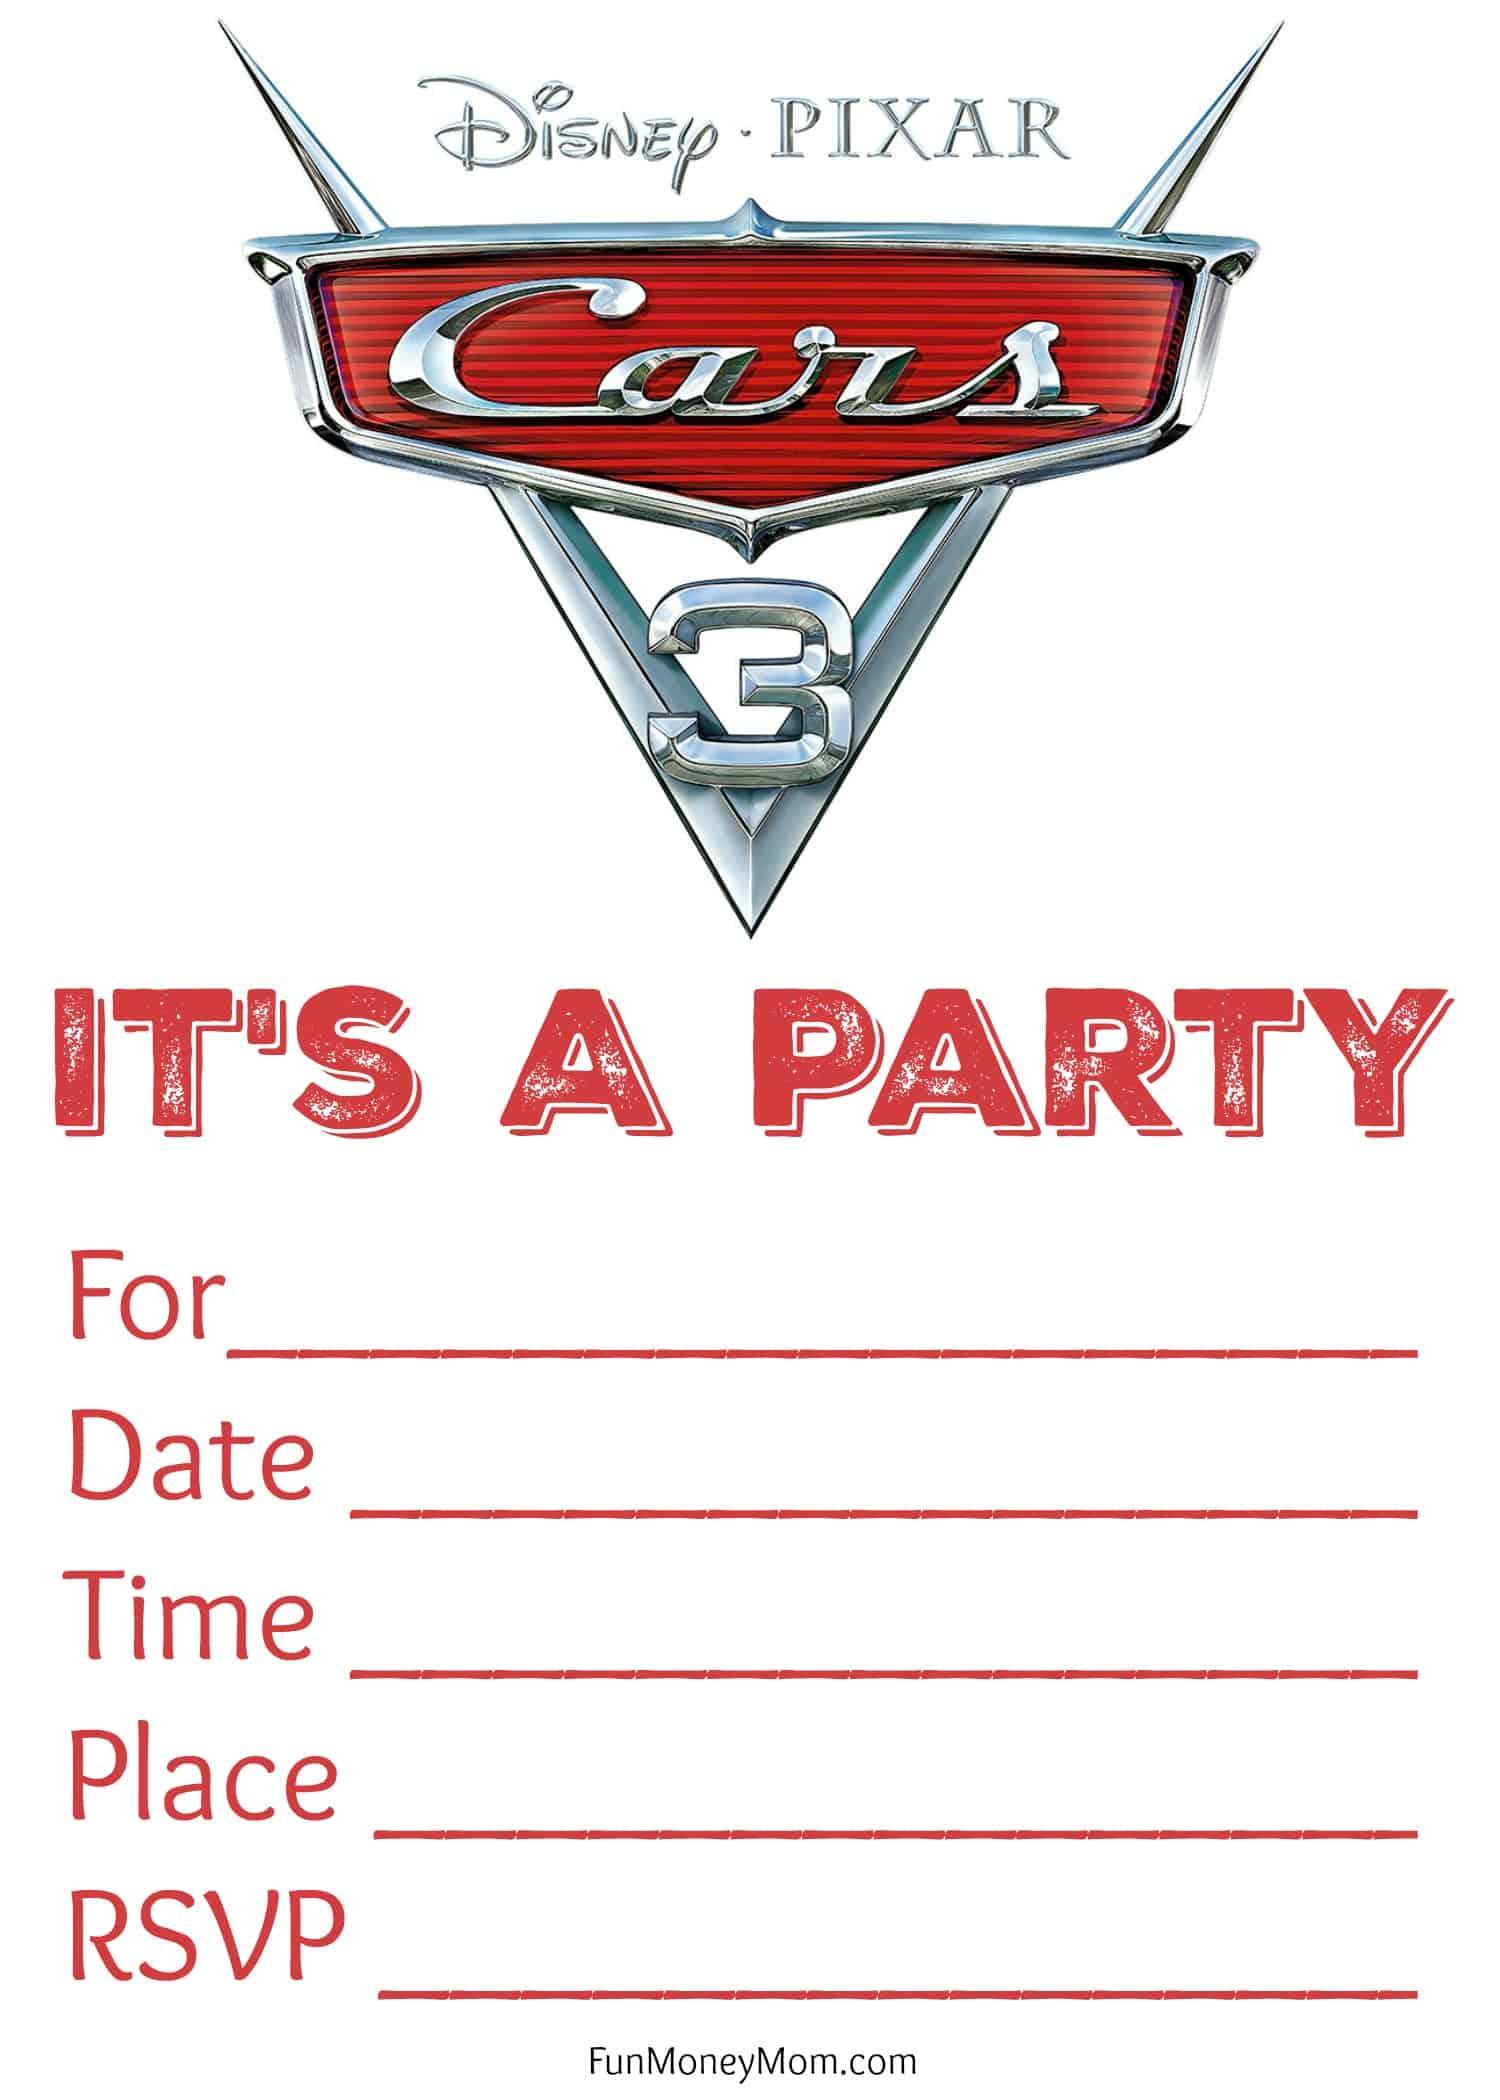 Free Printable Cars 3 Birthday Invitations - Fun Money Mom